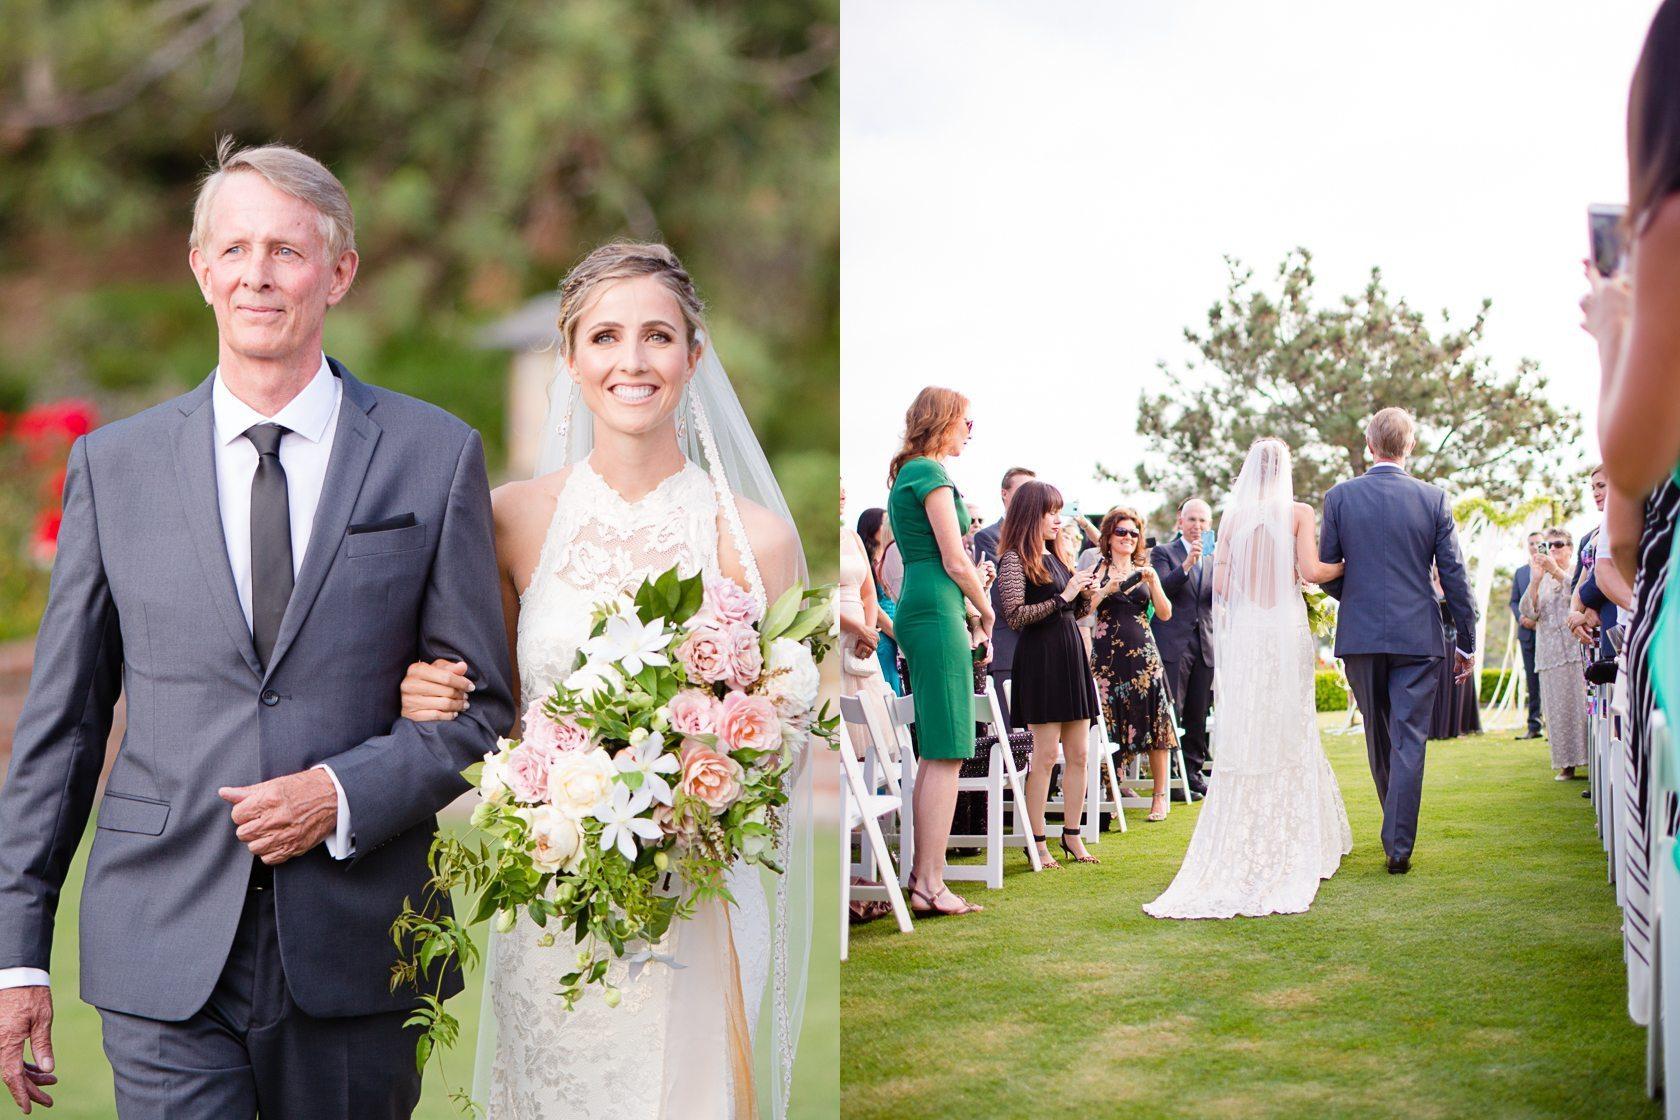 The_Lodge_at_Torrey_Pines_Wedding_045.jpg